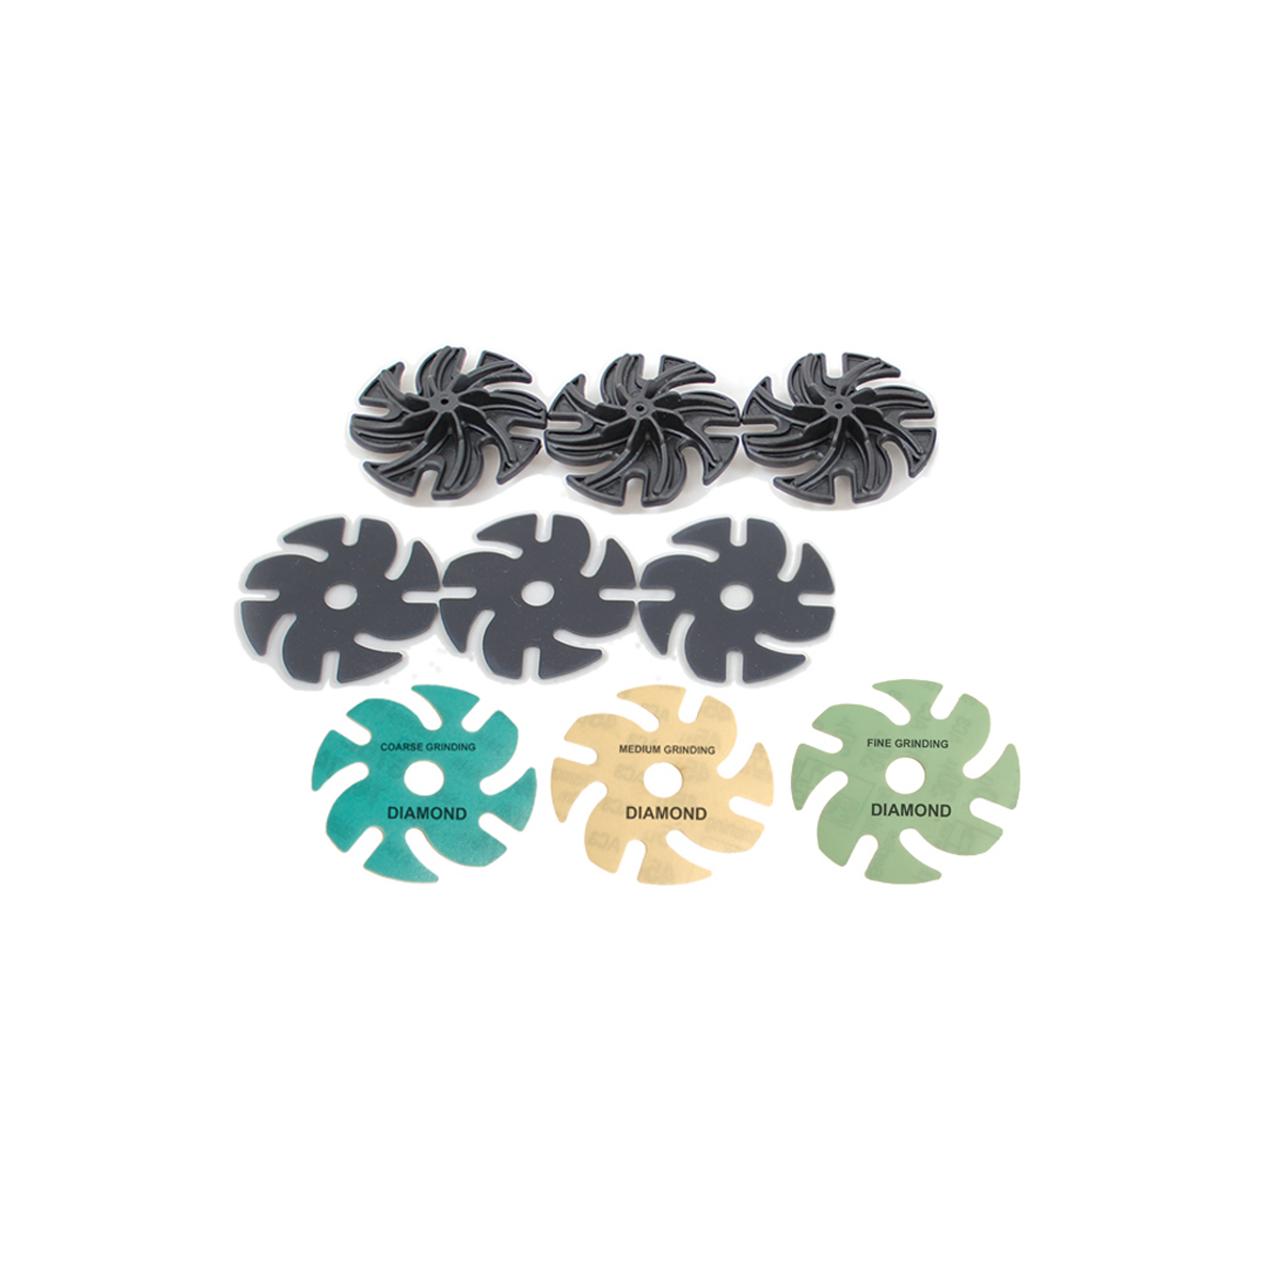 JoolTool Add-on: Carbide Sharpening Add-On Kit